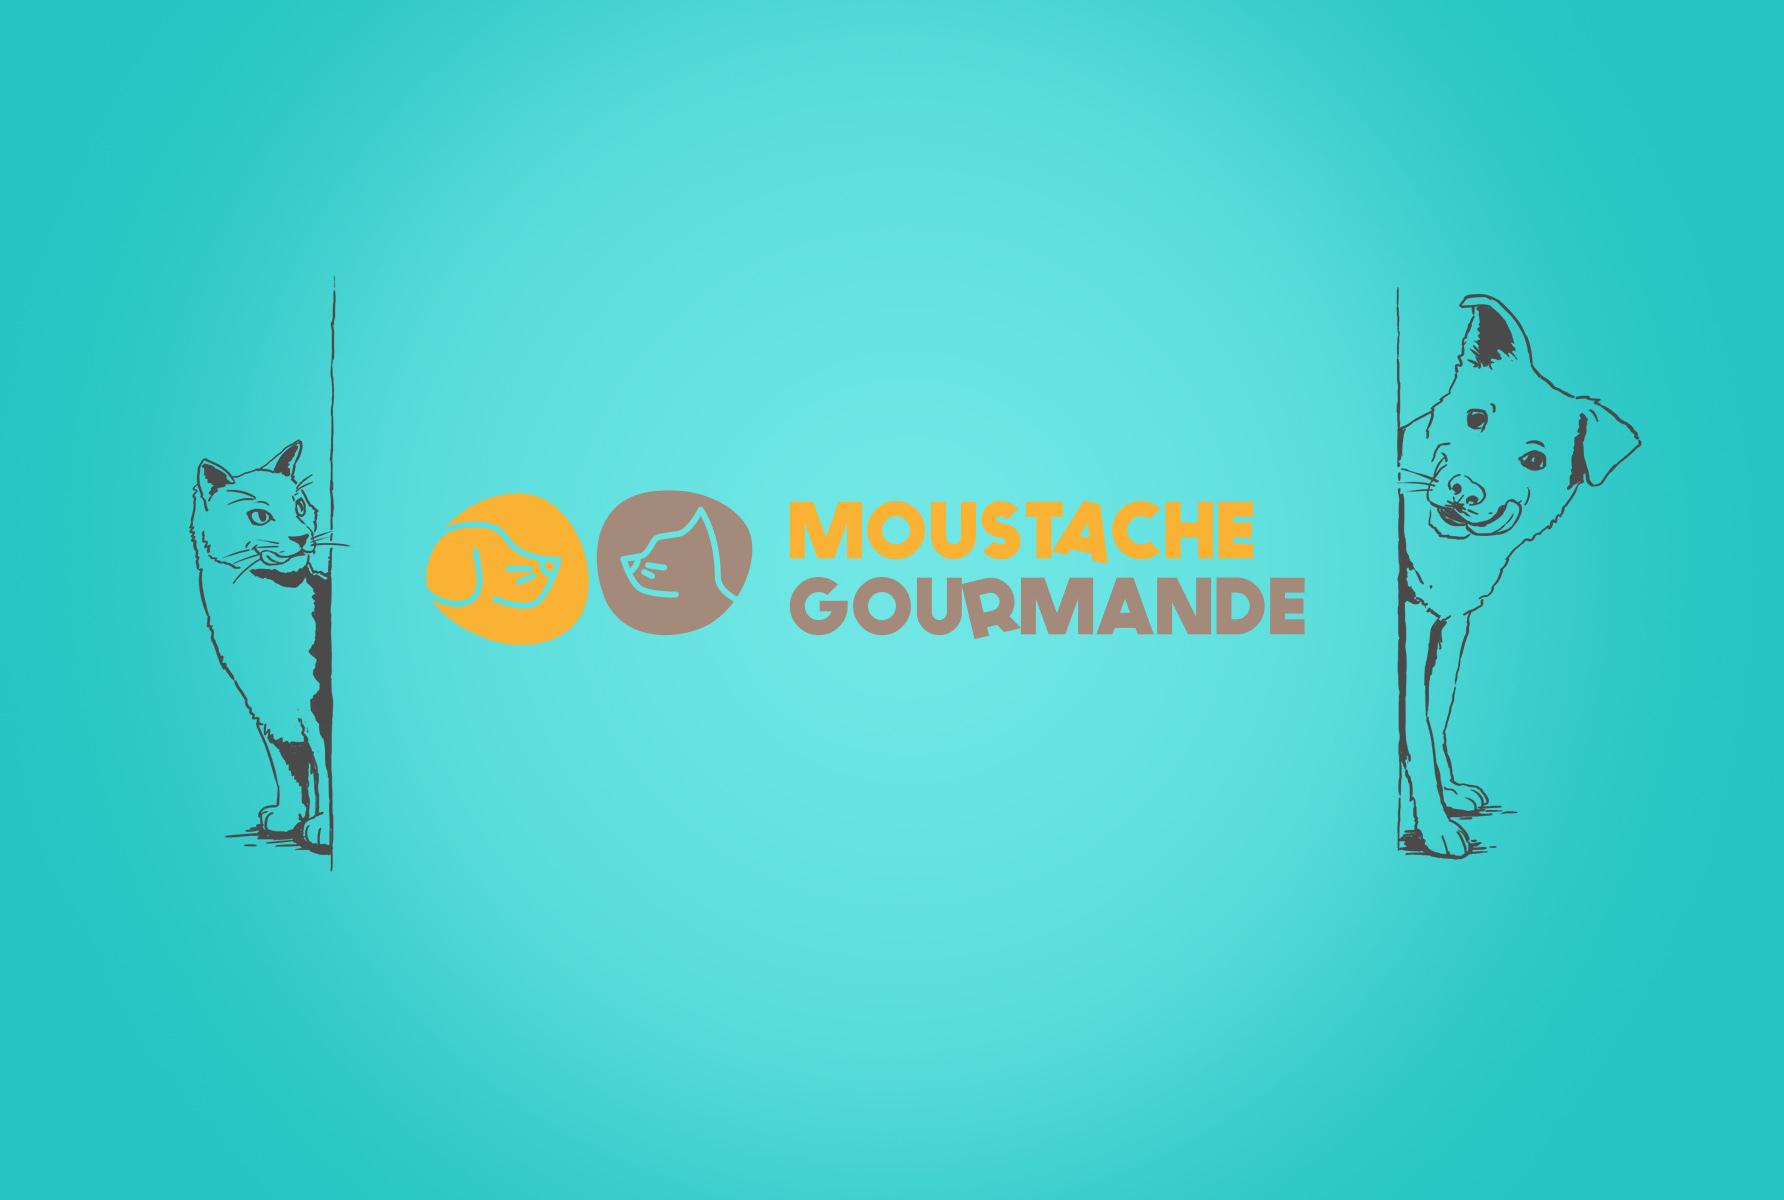 ikadia-moustache-gourmande-7